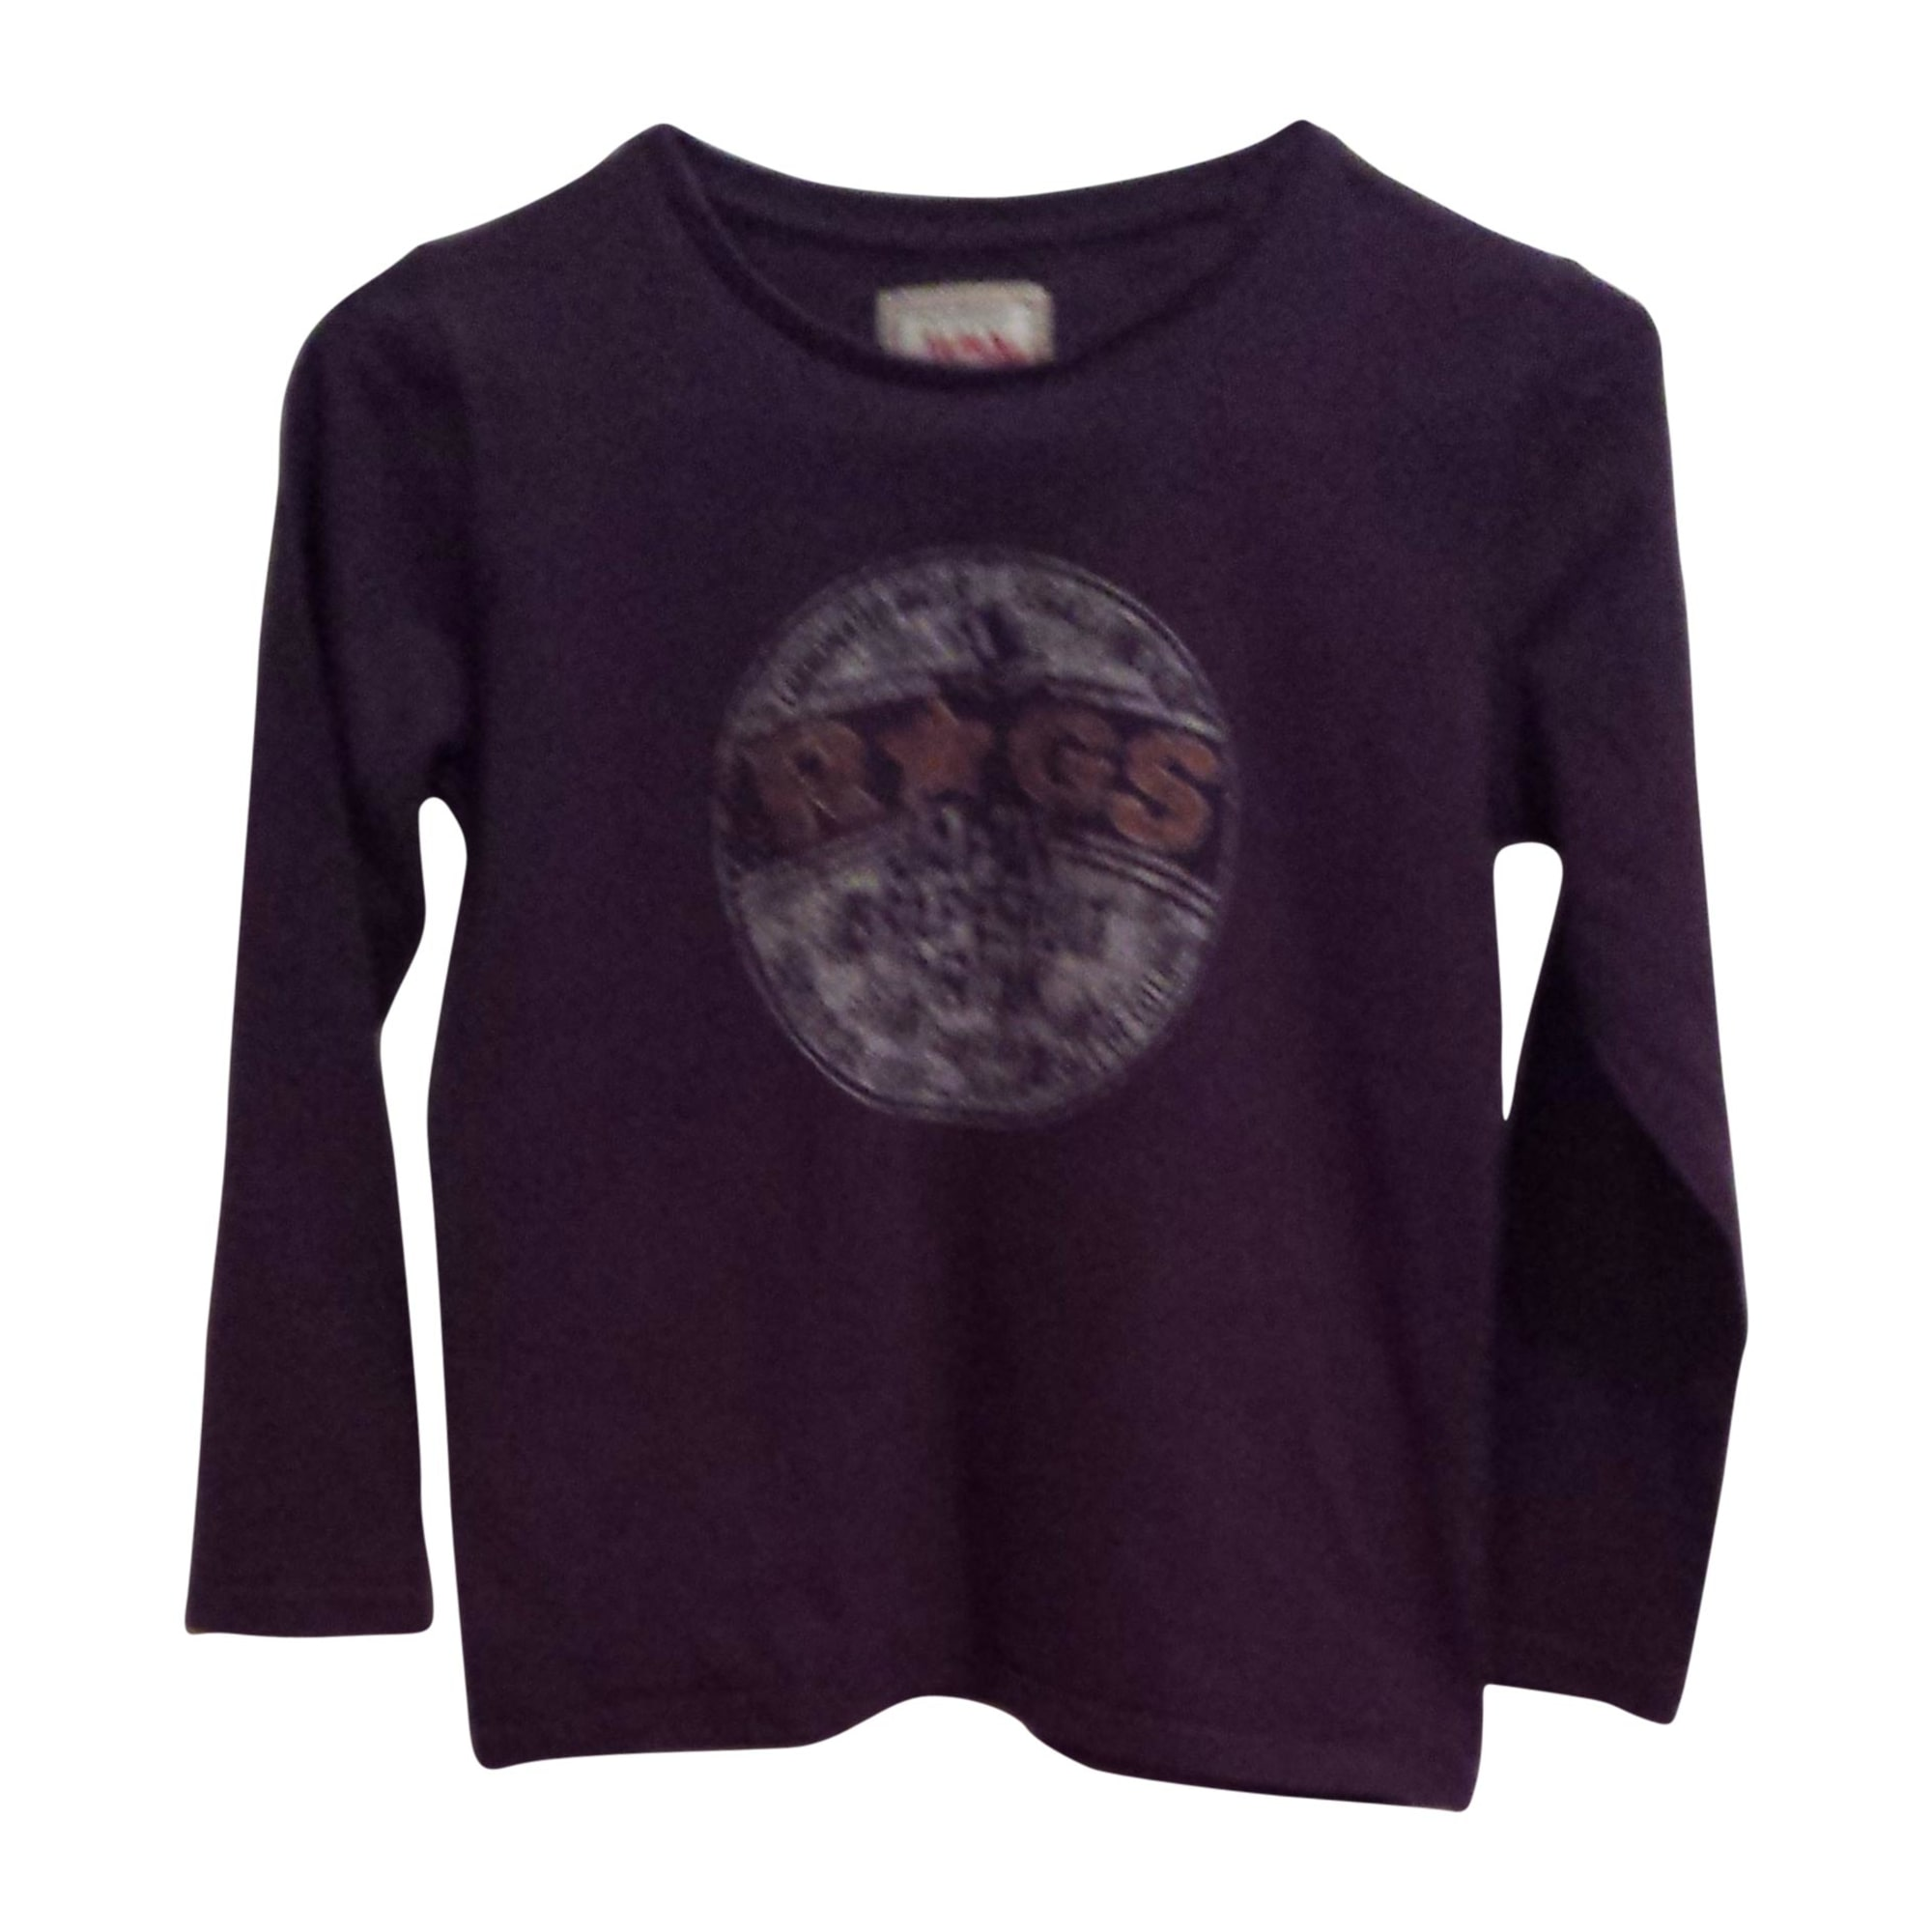 06337158c60c3 Tee-shirt JAPAN RAGS 5-6 ans violet - 2904814